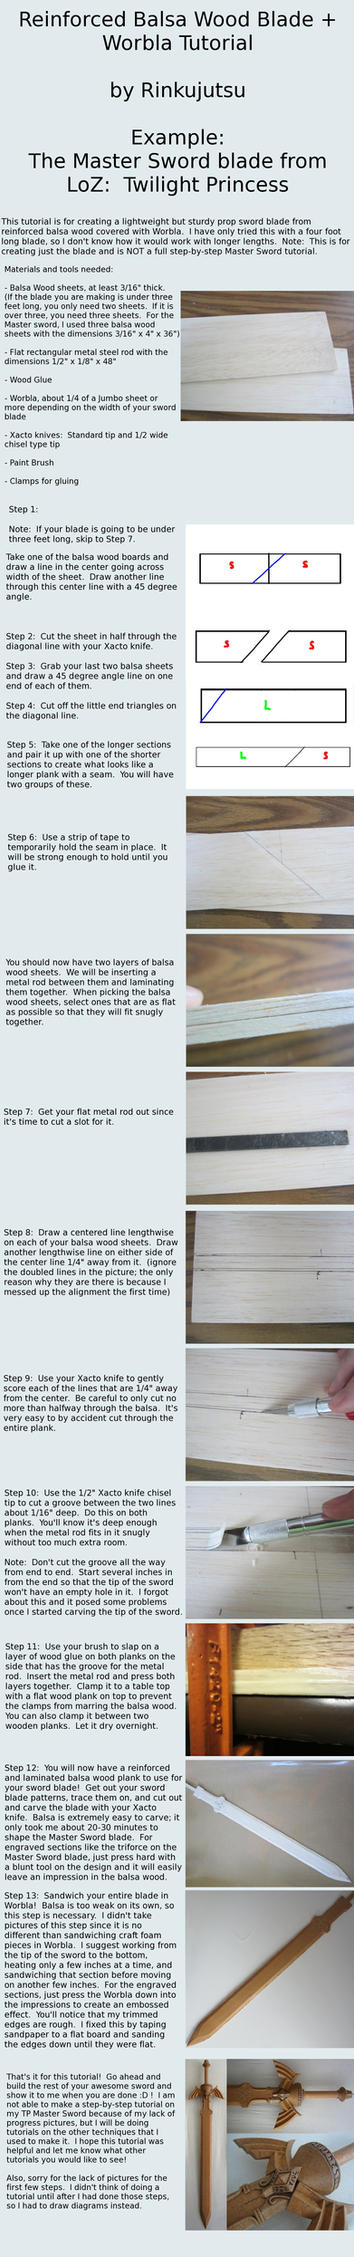 Reinforced Balsa Blade Tutorial - TP Master Sword by Rinkujutsu